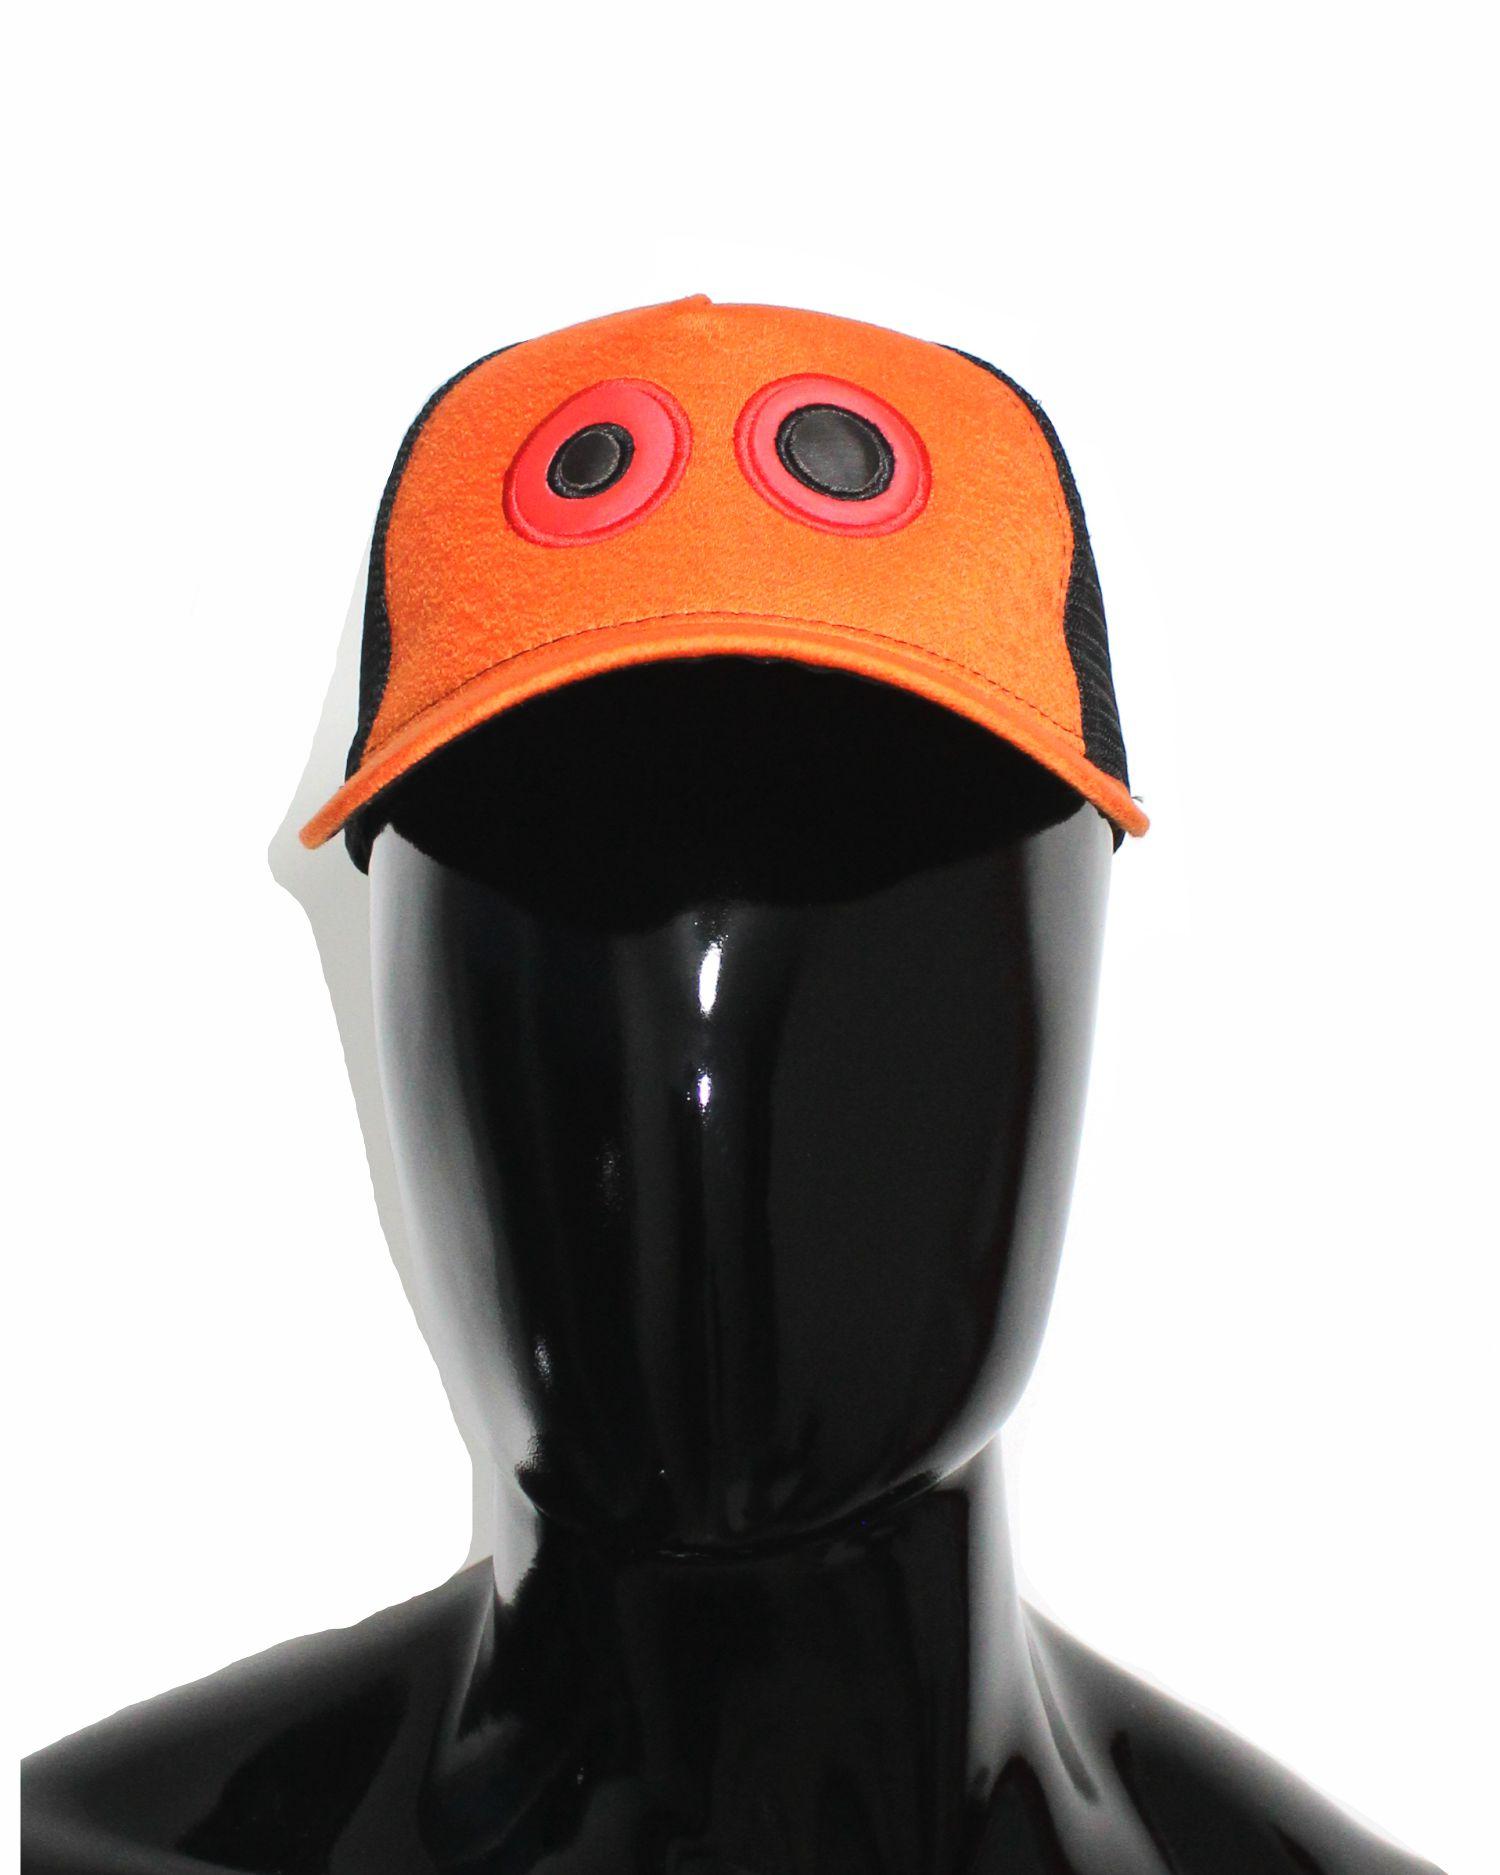 Gorra lona naranja y visera naranja, con maya negra ojos bordados grandes 01 $37.000